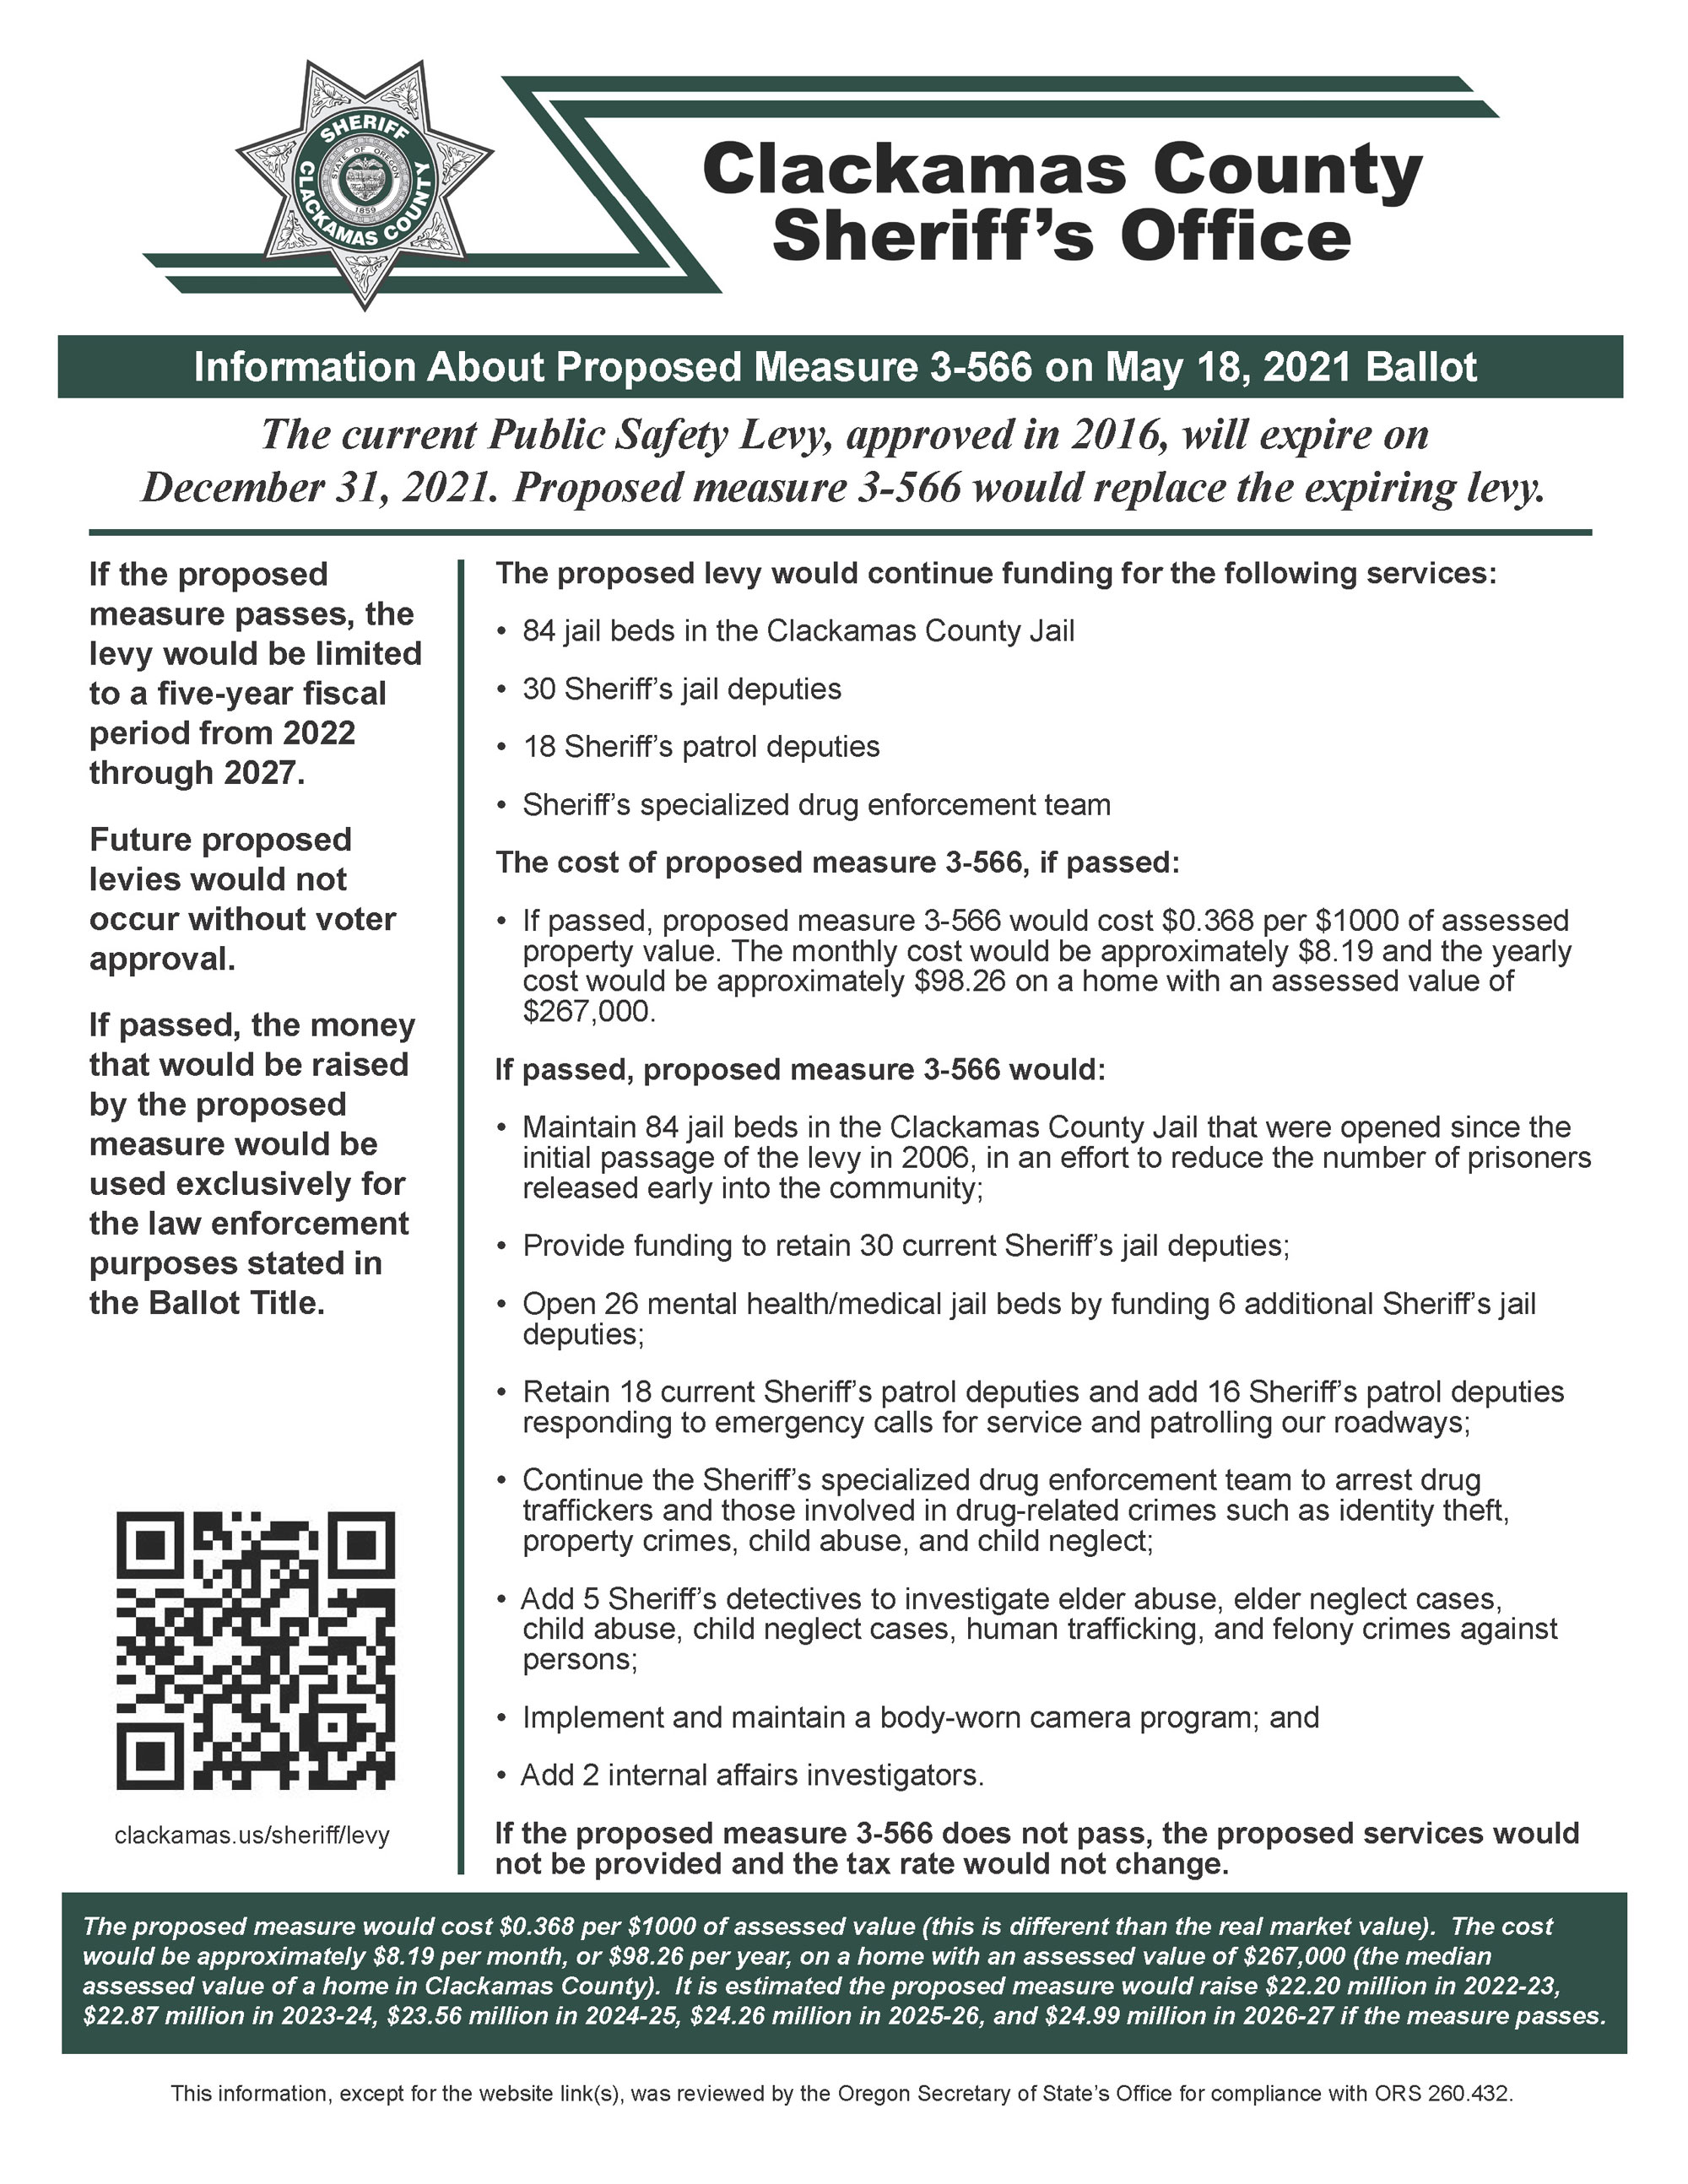 3-566 Information Sheet (JPG)